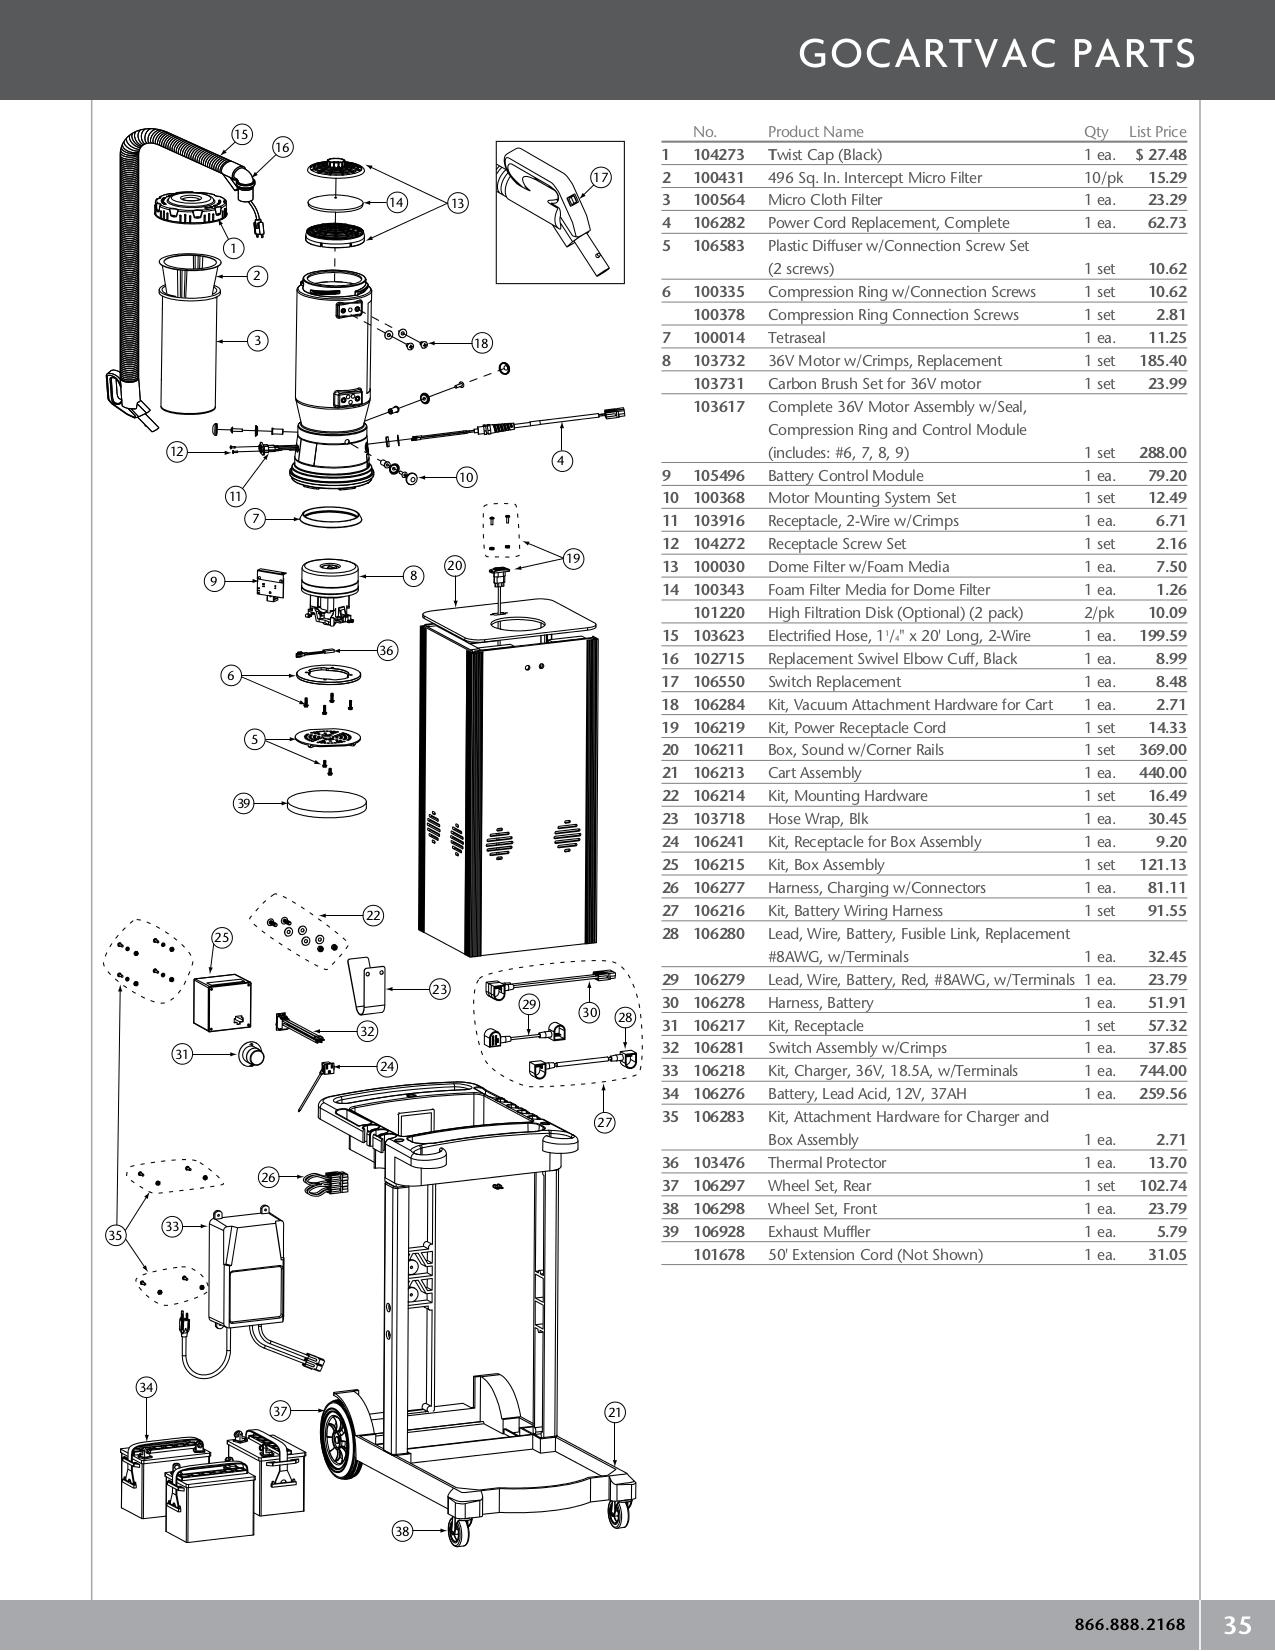 Download Free For Pro Team Gocartvac Vacuum Manual